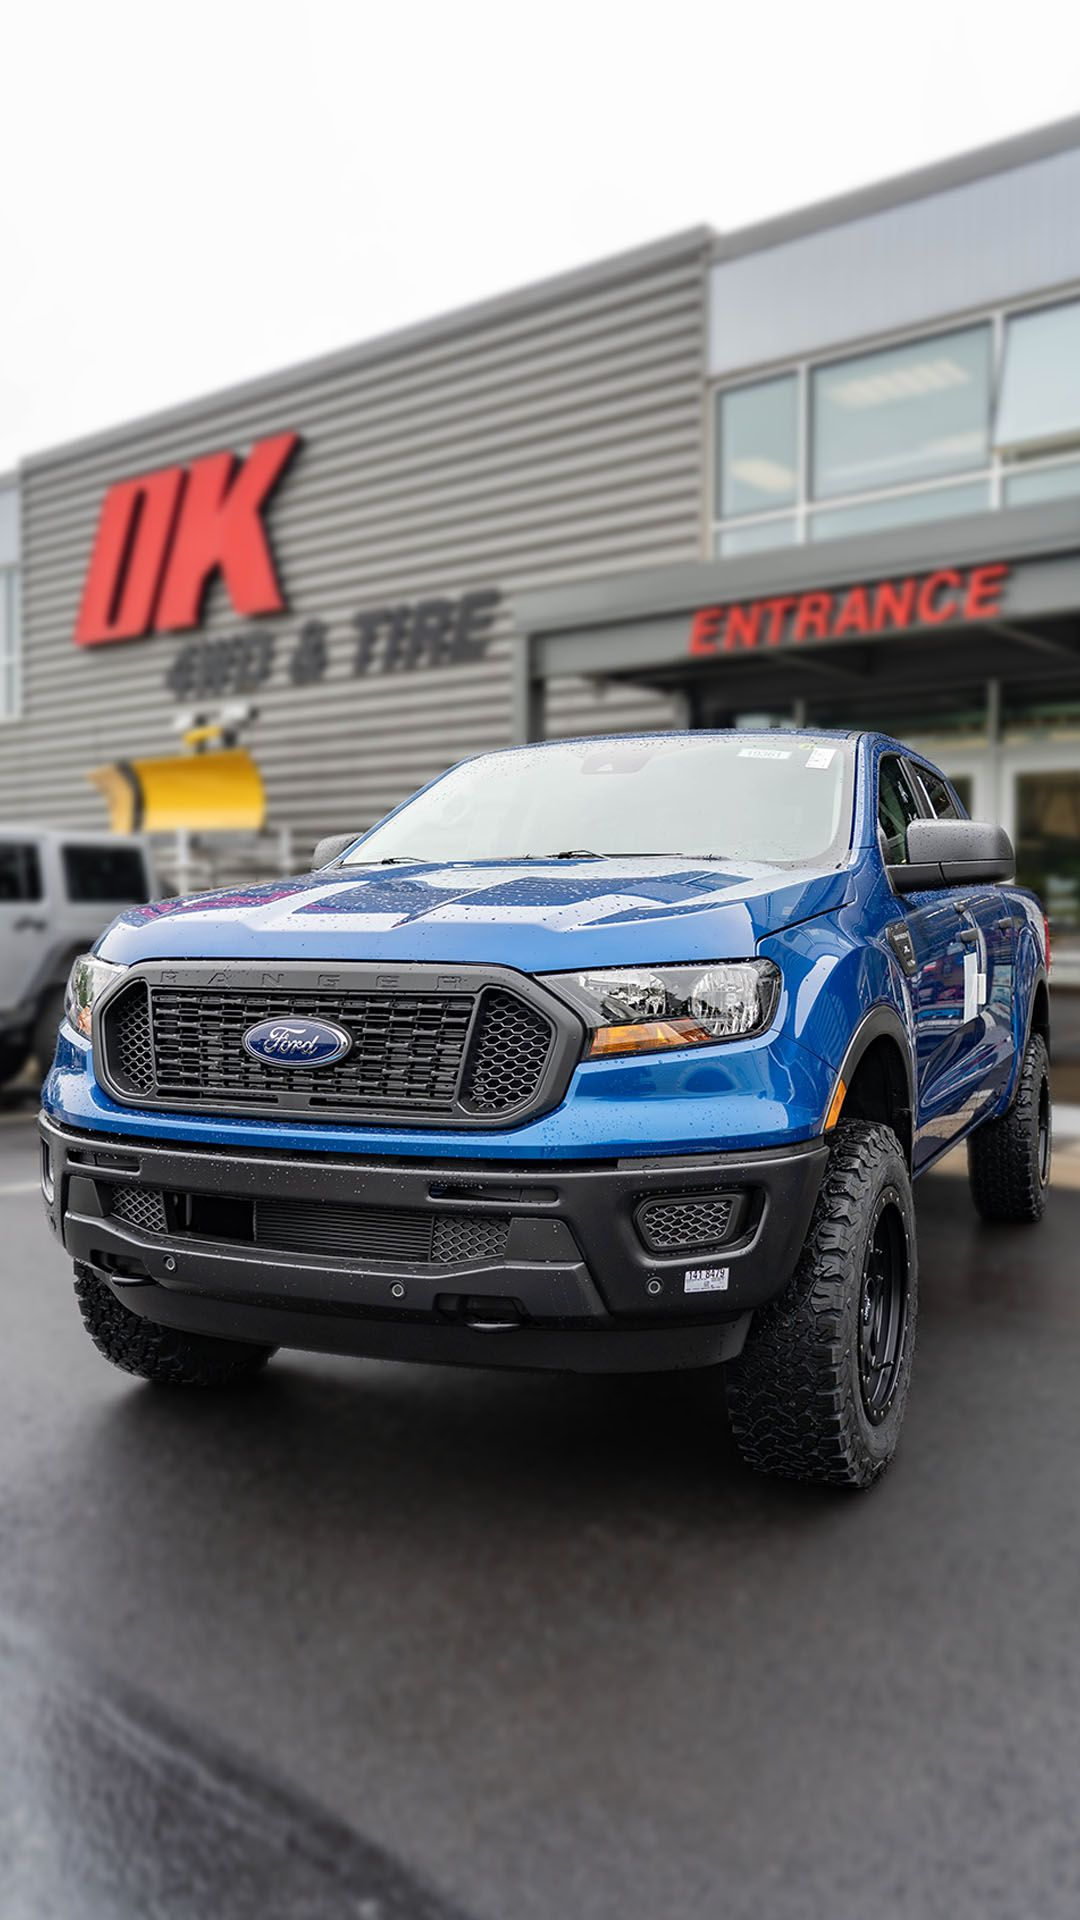 Online Garage 2019 Ford Ranger 2019 Ford Ranger Ford Ranger